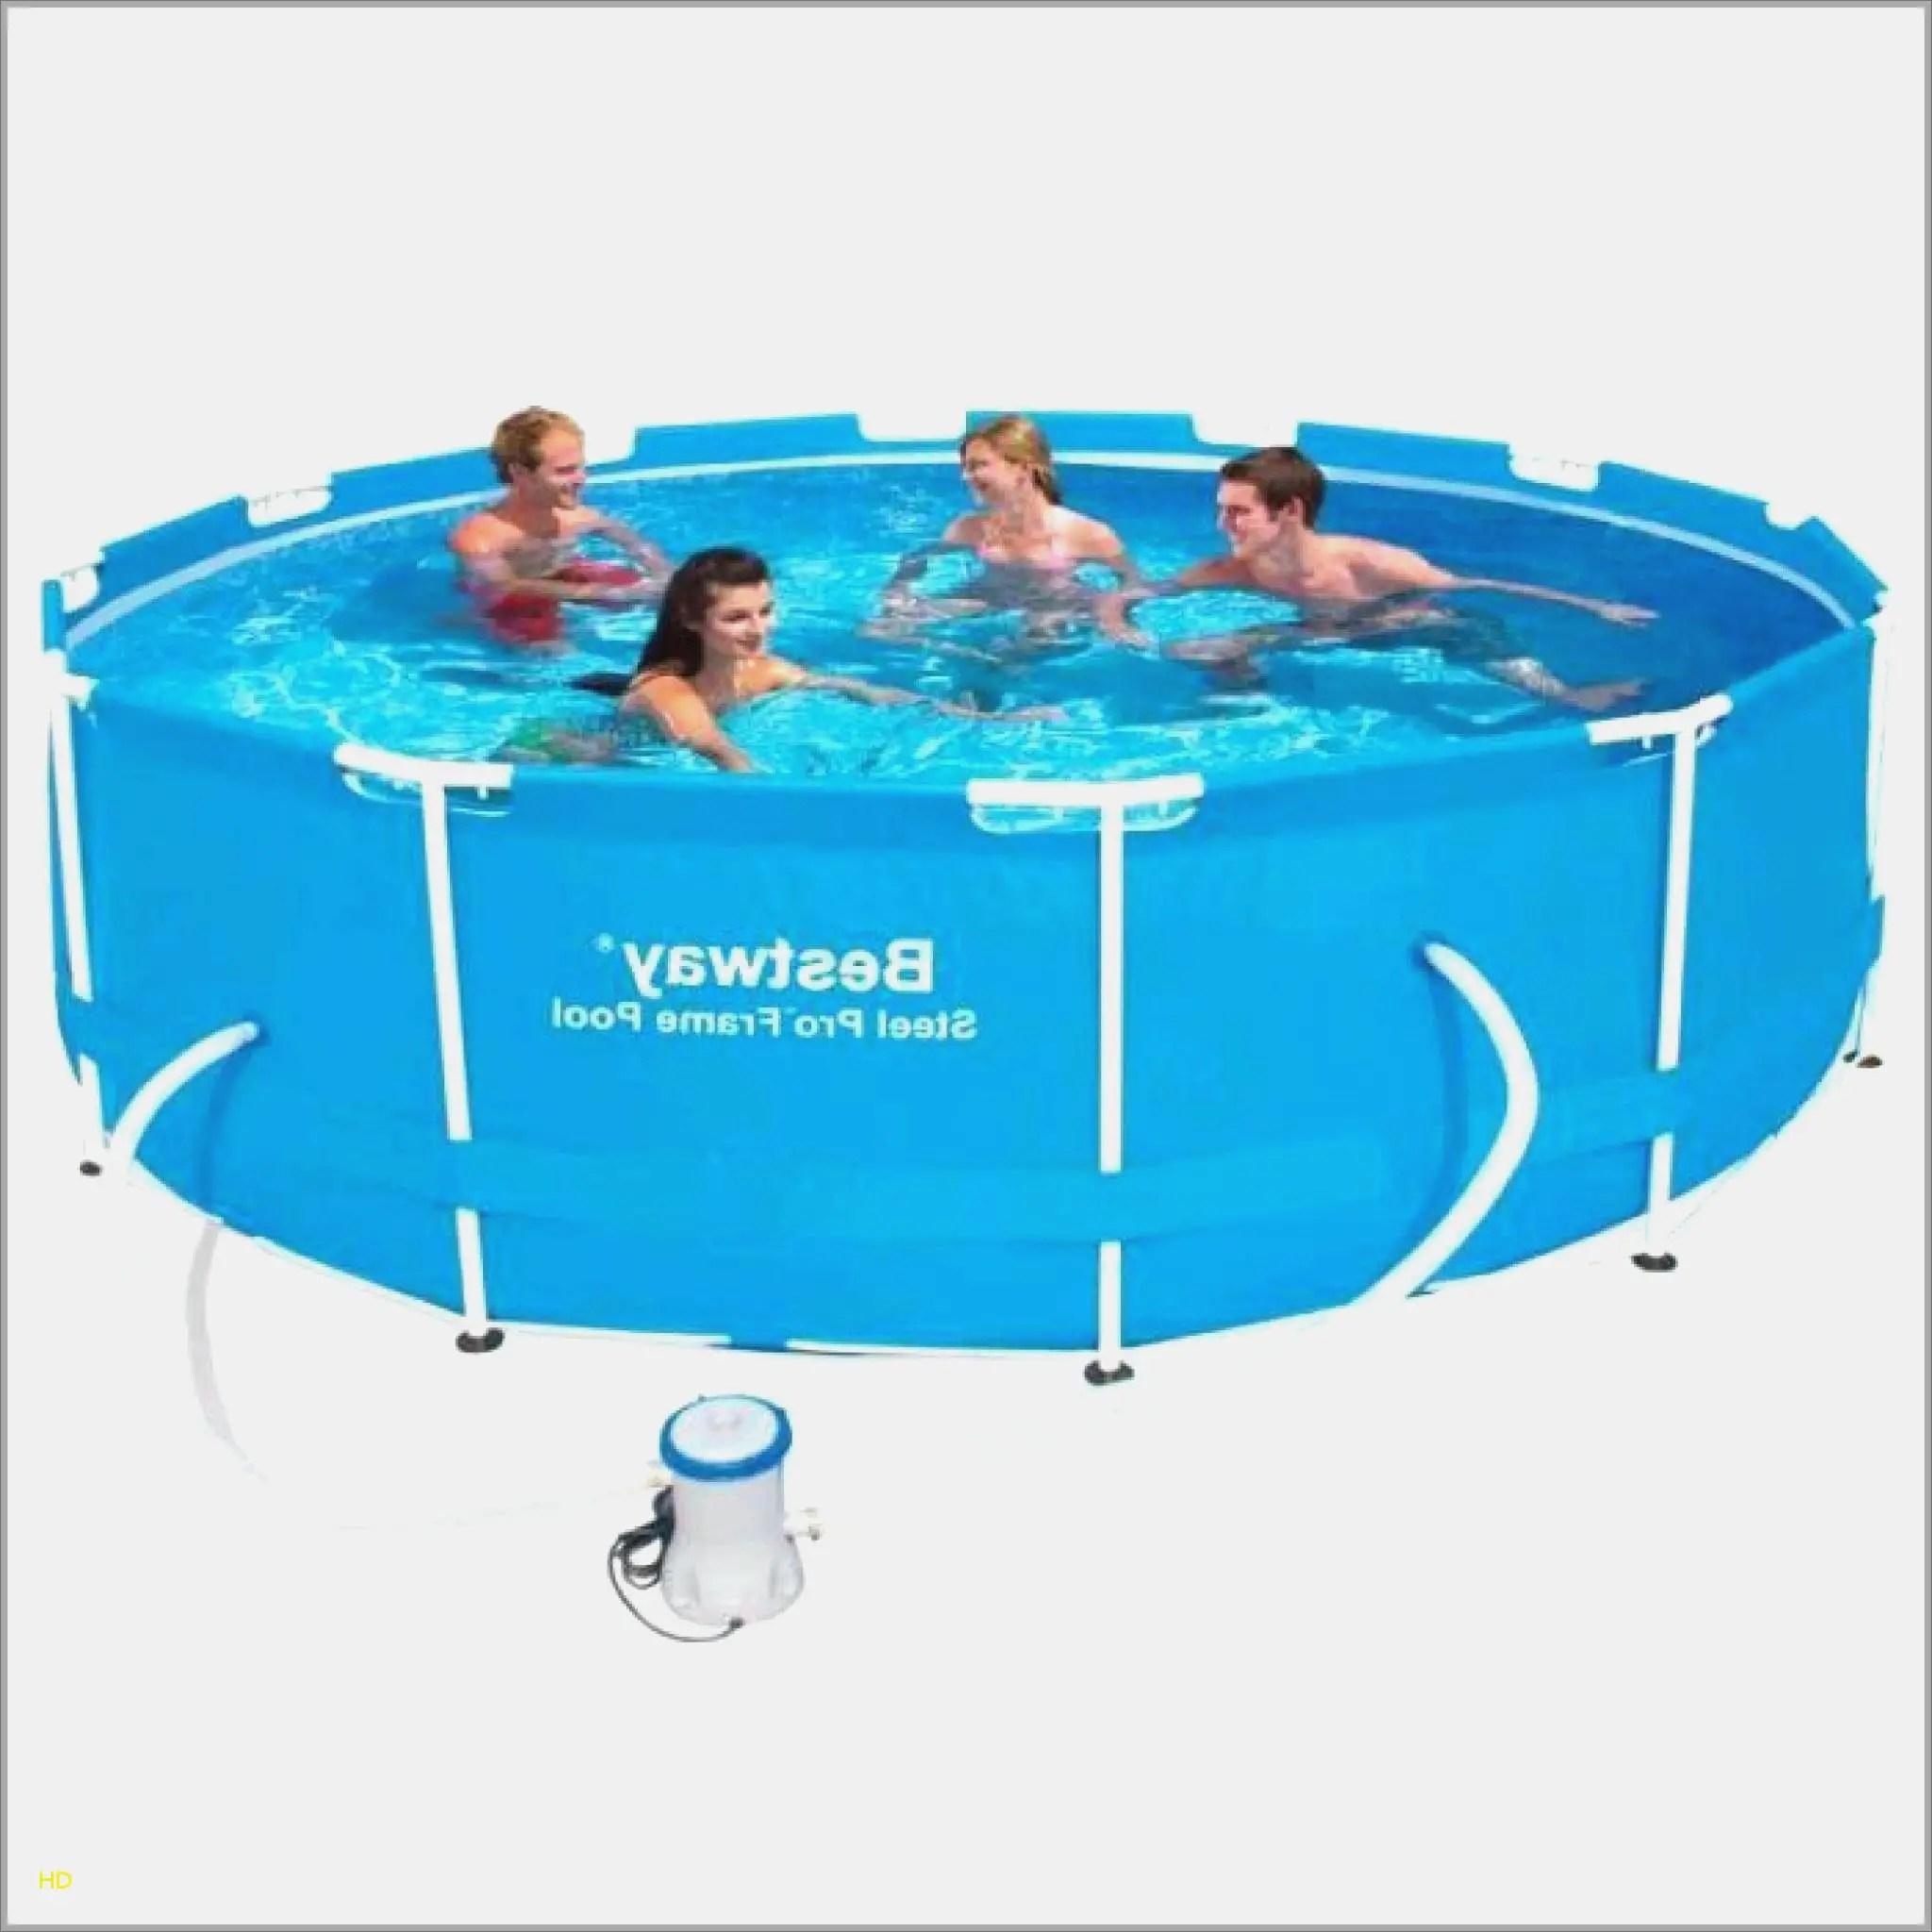 vekony tanfolyam diagram piscine